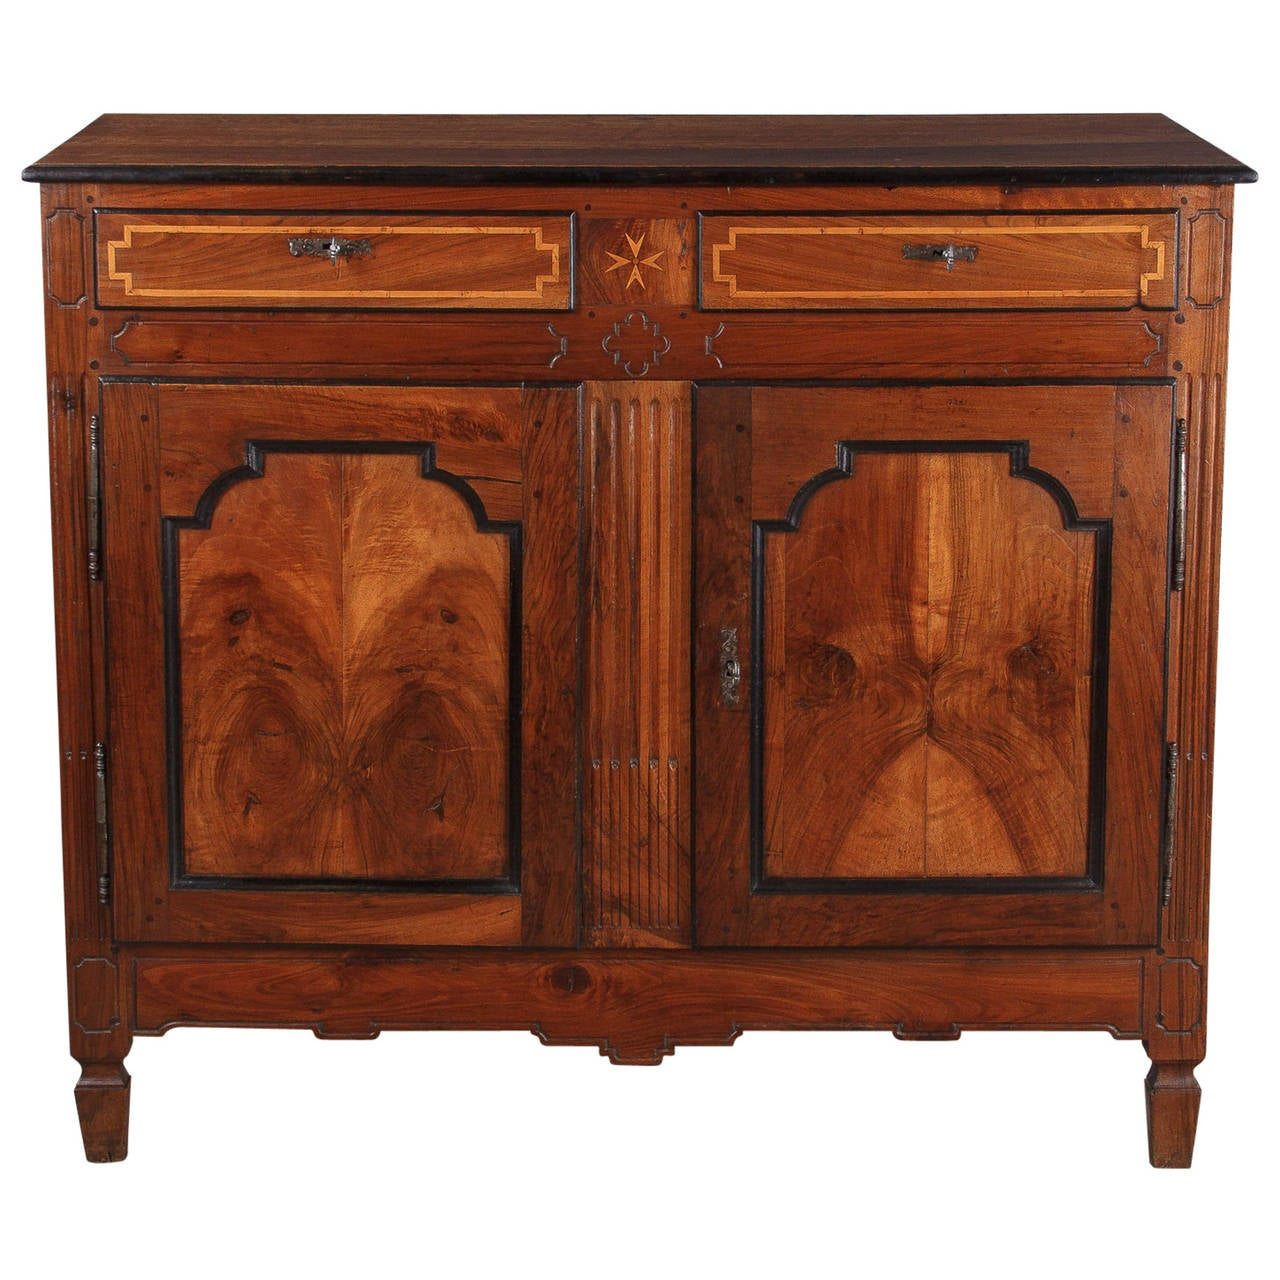 napoleon iii walnut buffet from france 1870s. Black Bedroom Furniture Sets. Home Design Ideas